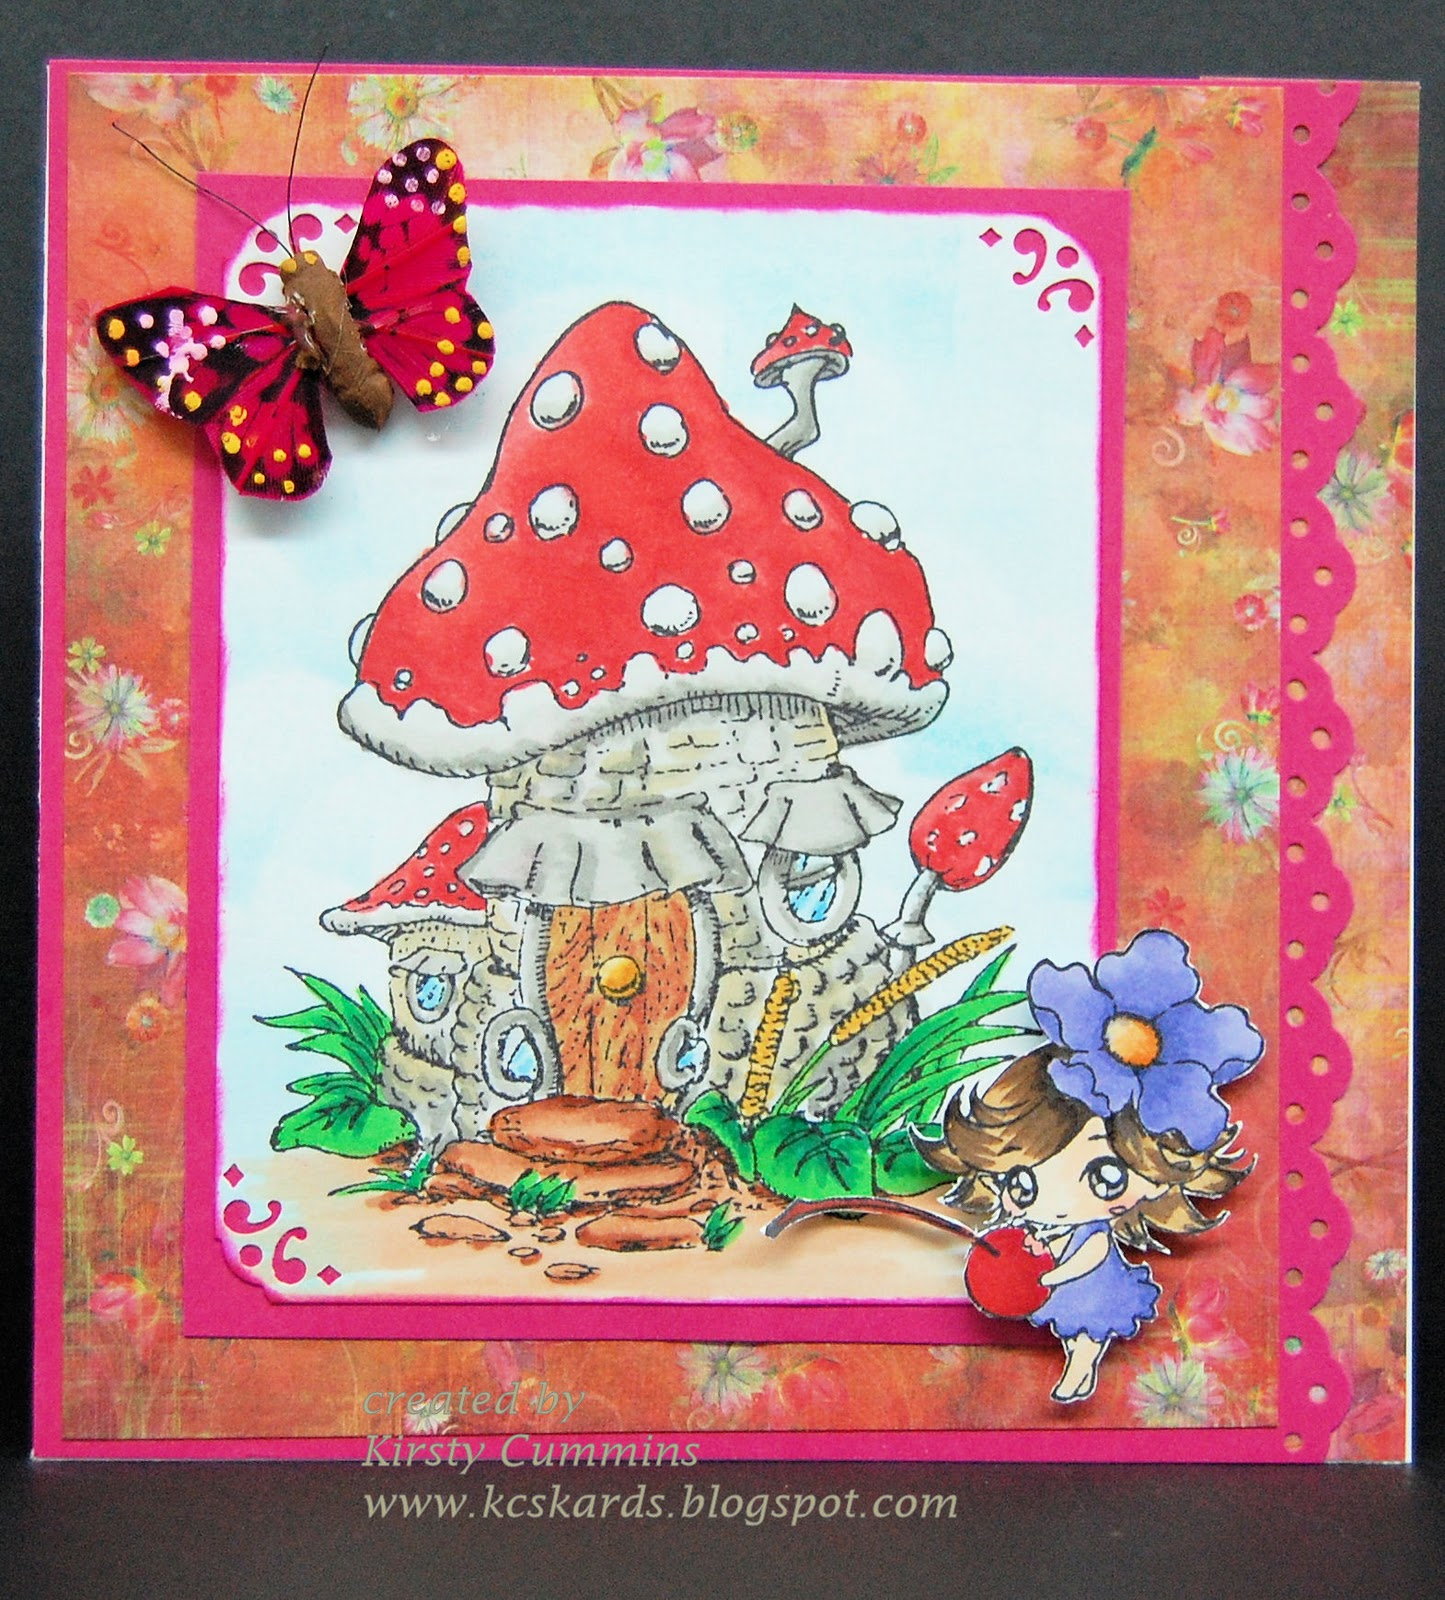 http://1.bp.blogspot.com/-99QSUeAEJw0/TyNg0R38HGI/AAAAAAAAAmk/t-4Qt8Nfxsw/s1600/happy%2Bbirthday%2Bnicole%2B2012.jpg